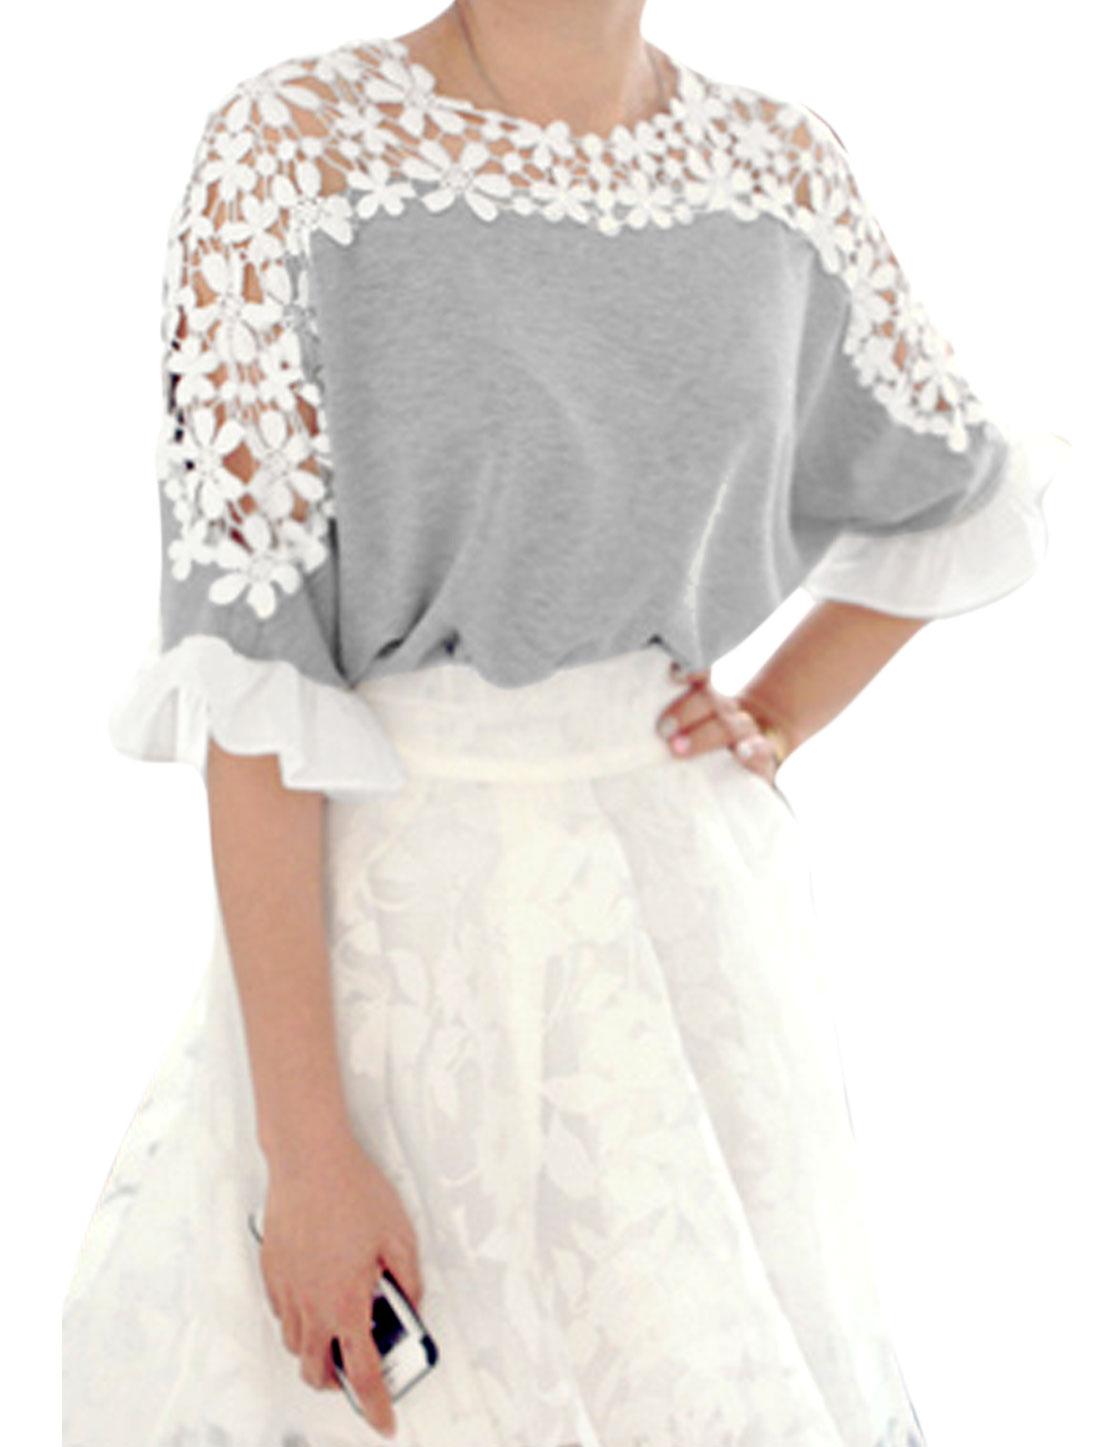 Lady Half Batwing Sleeve Crochet Panel Self-tie Bowknot Back Top Gray XS